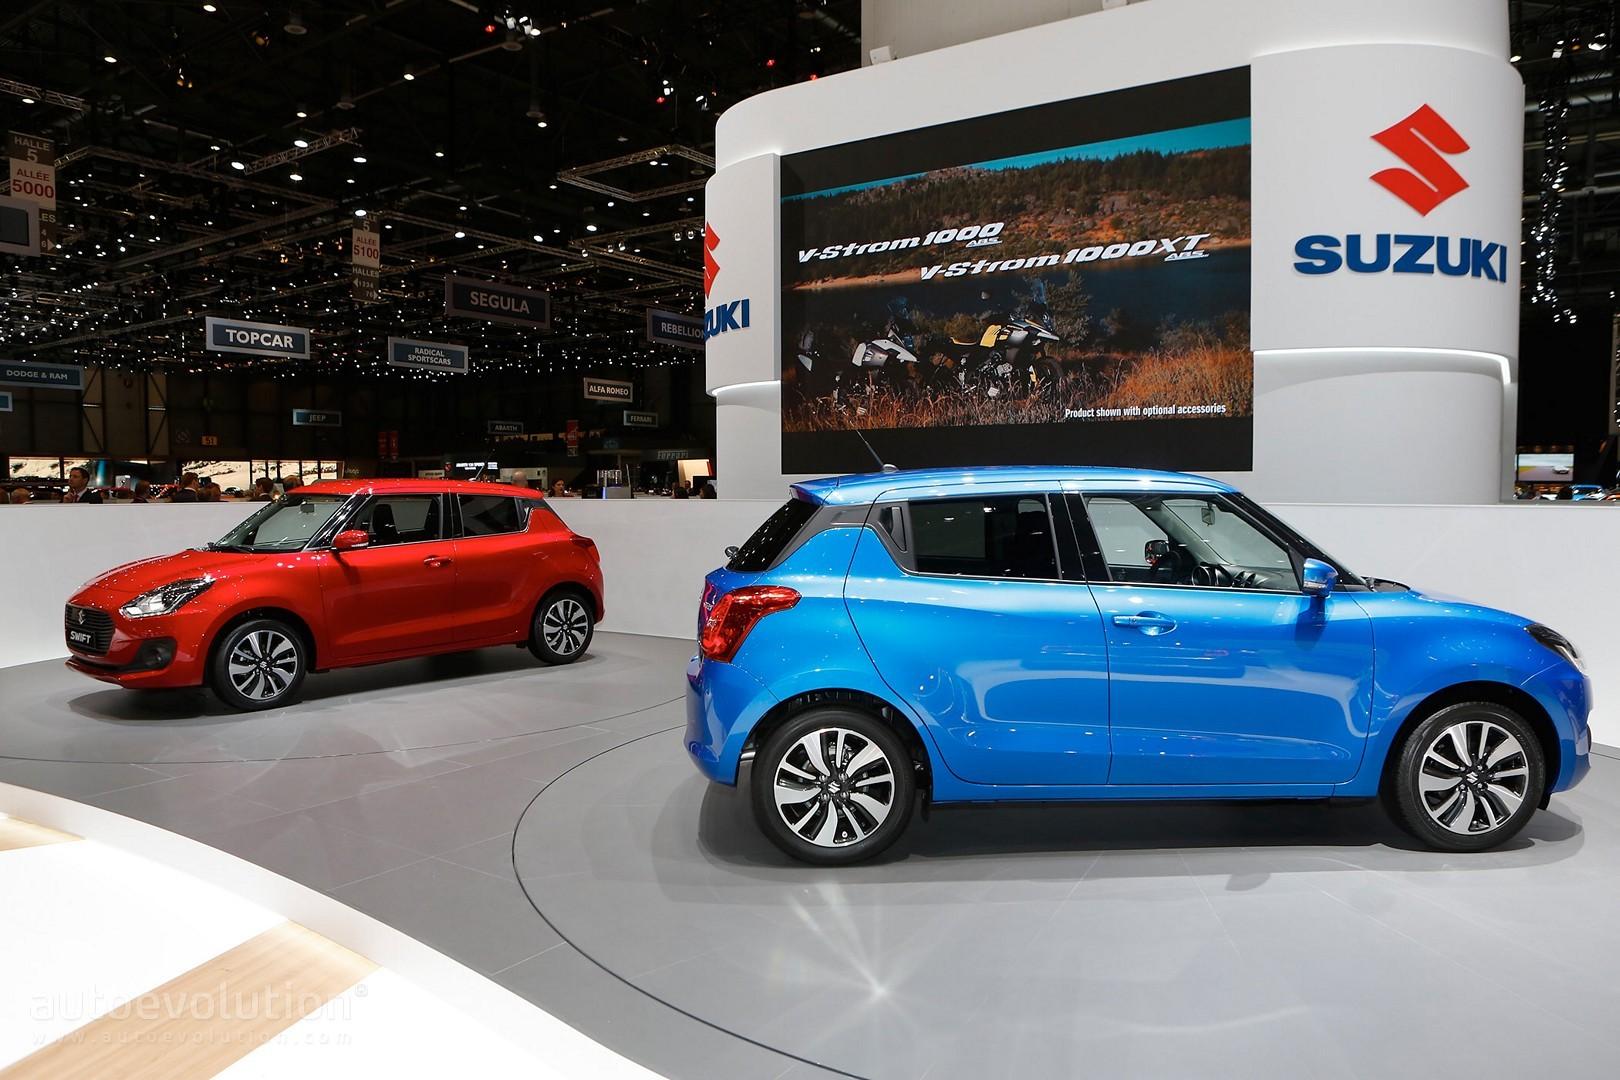 2017 Suzuki Swift Makes European Debut in Geneva - autoevolution